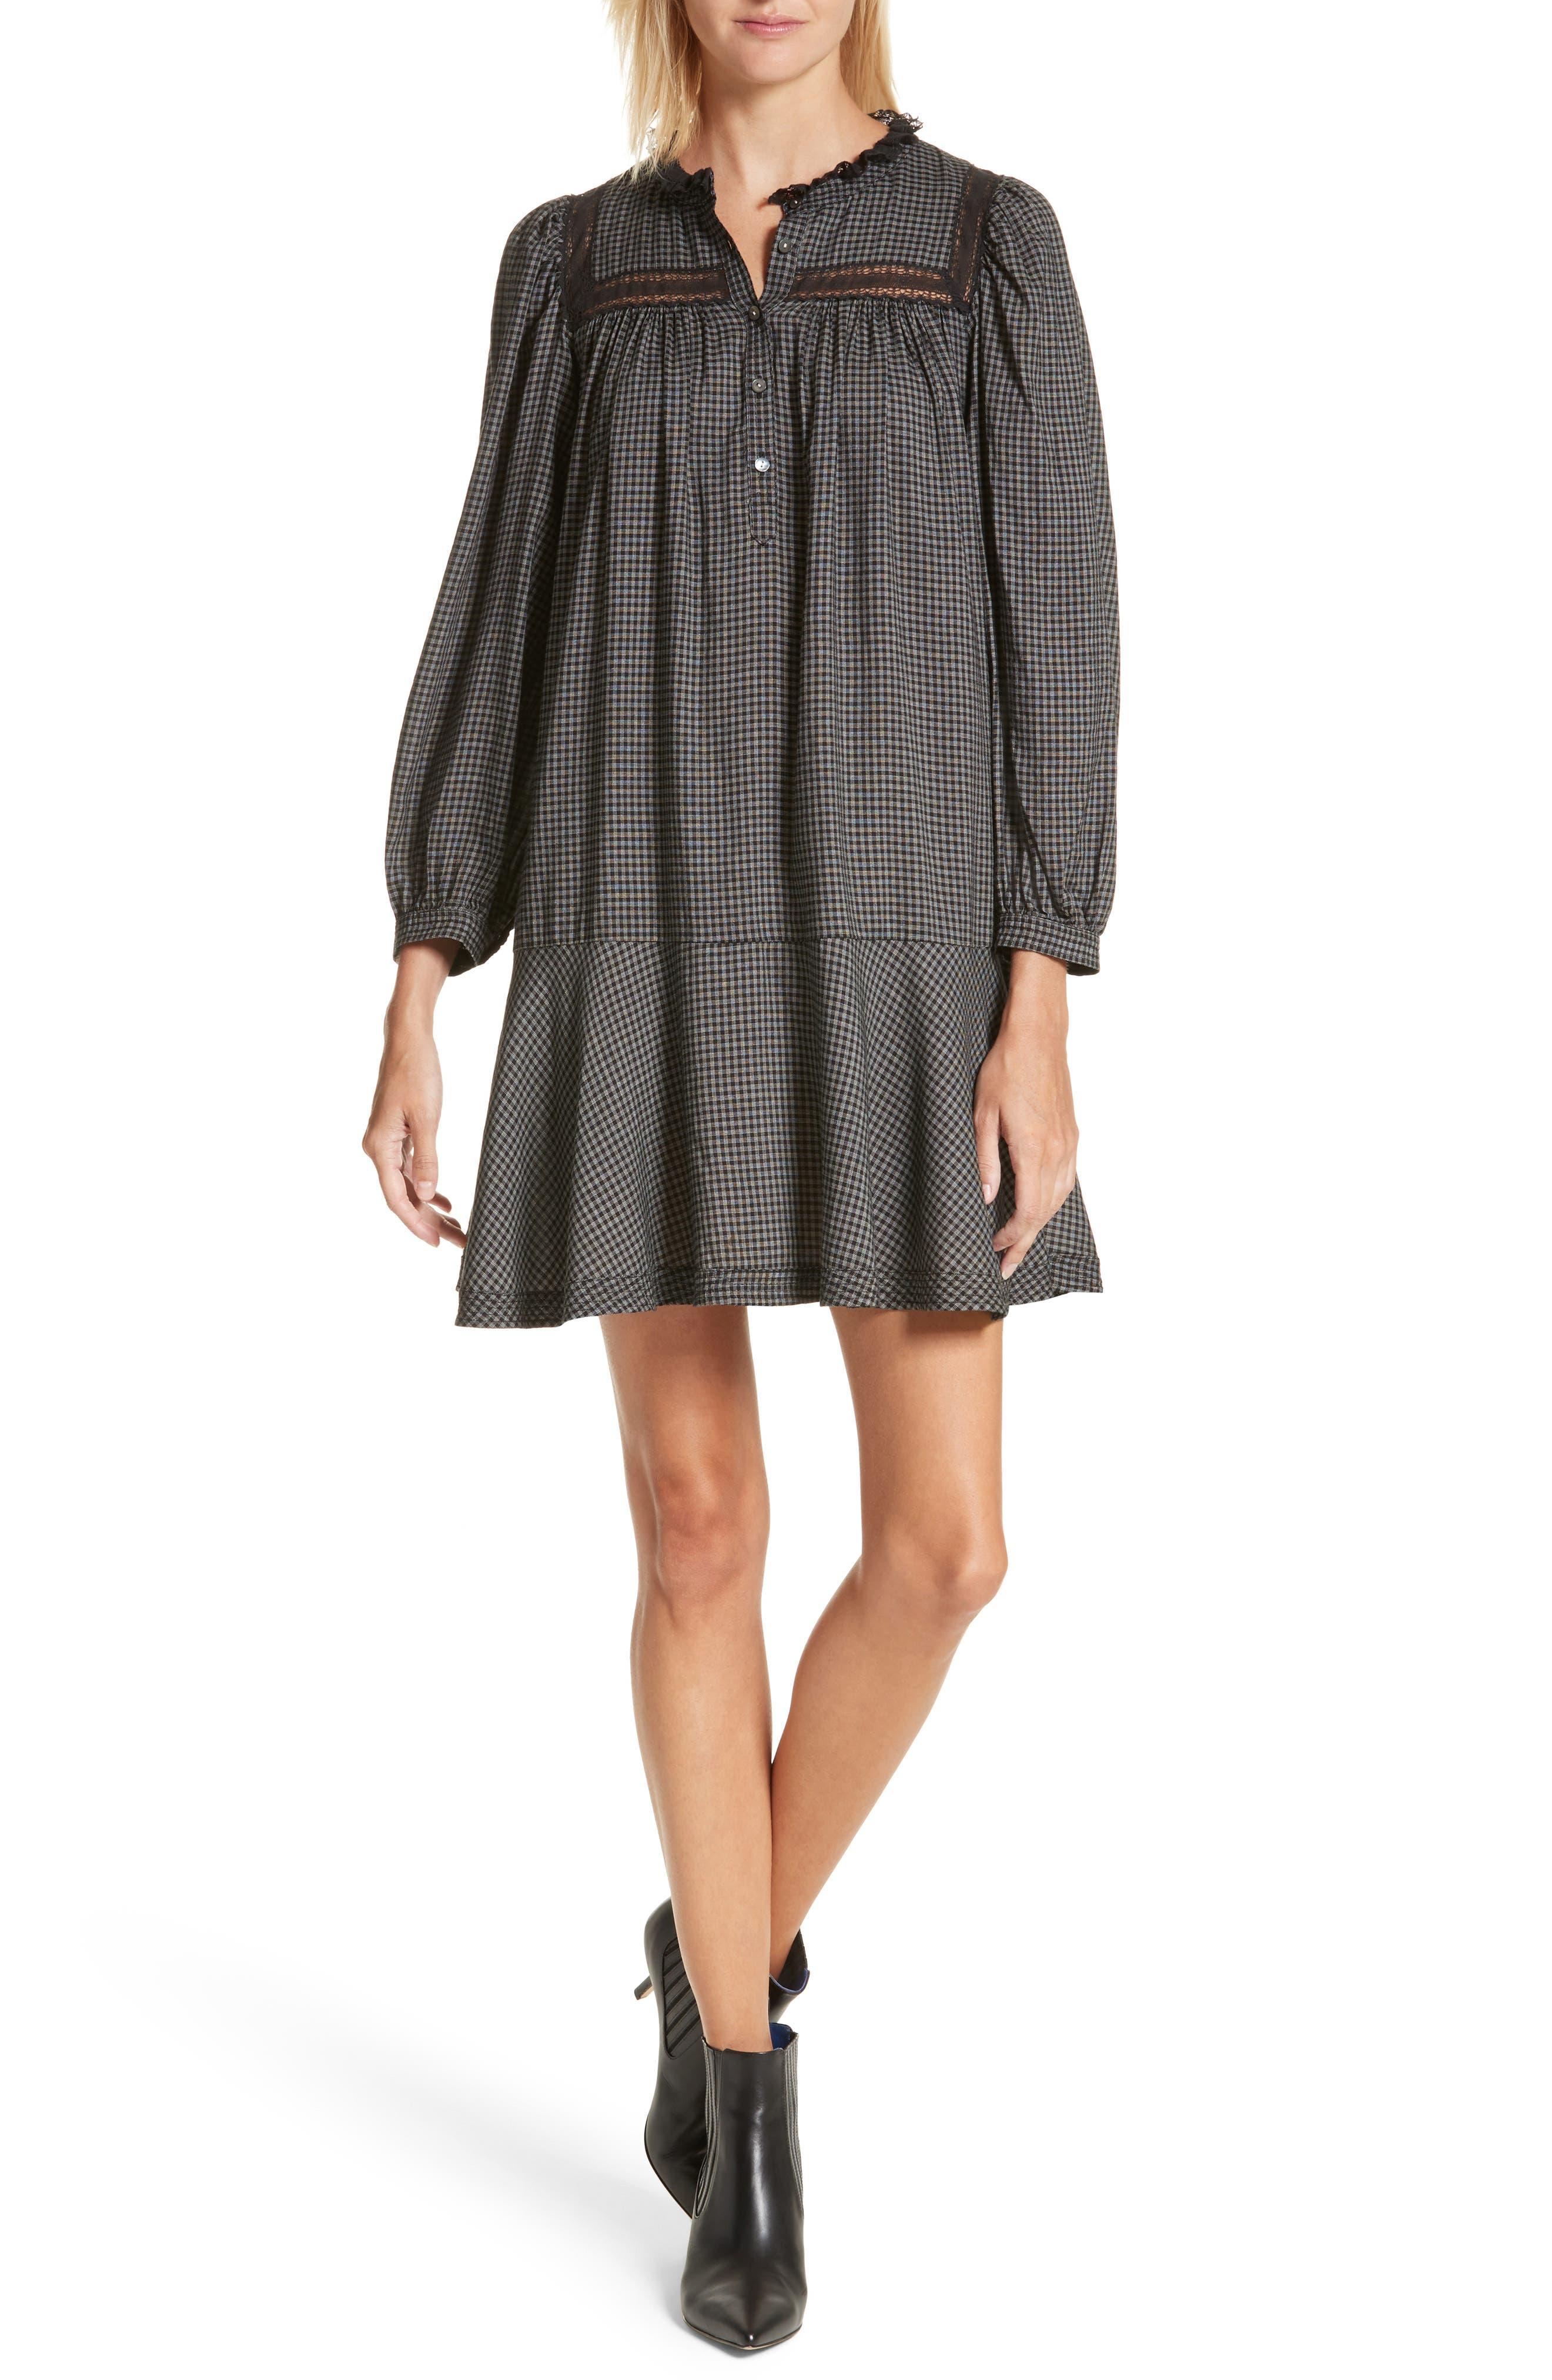 La Vie Rebecca Taylor Drop Waist Plaid Dress